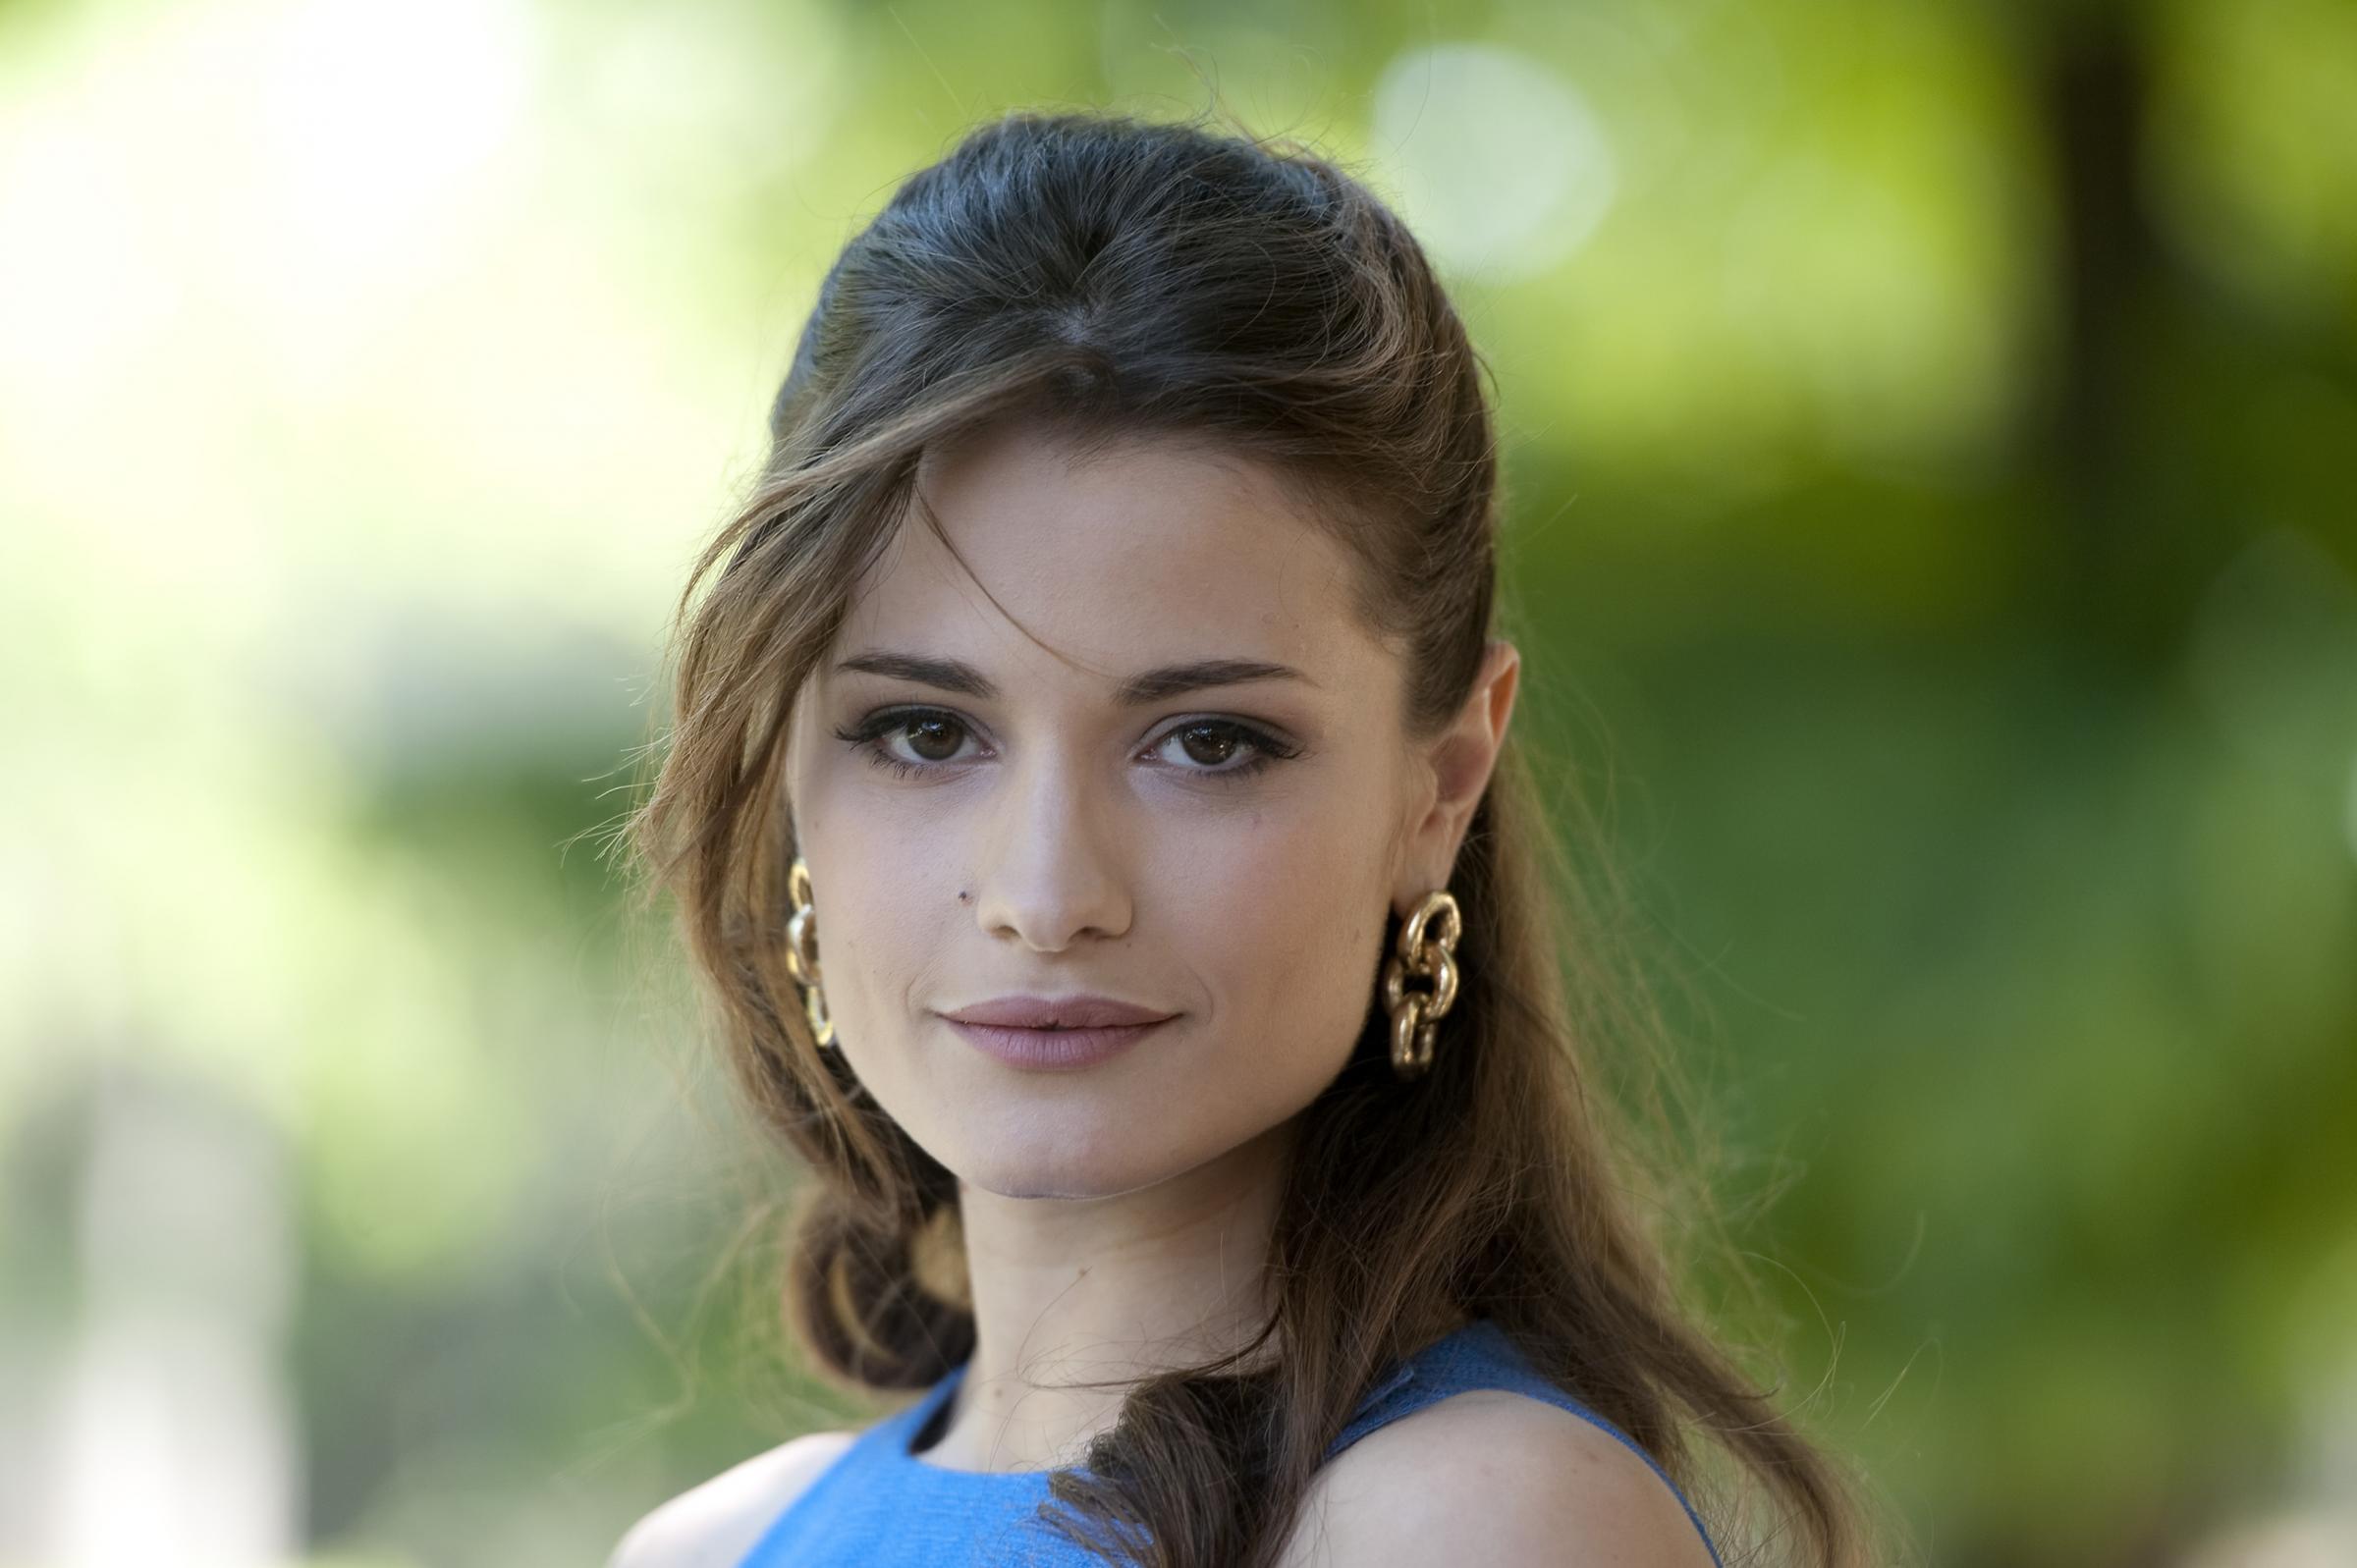 Giulia Gorietti - Images Actress